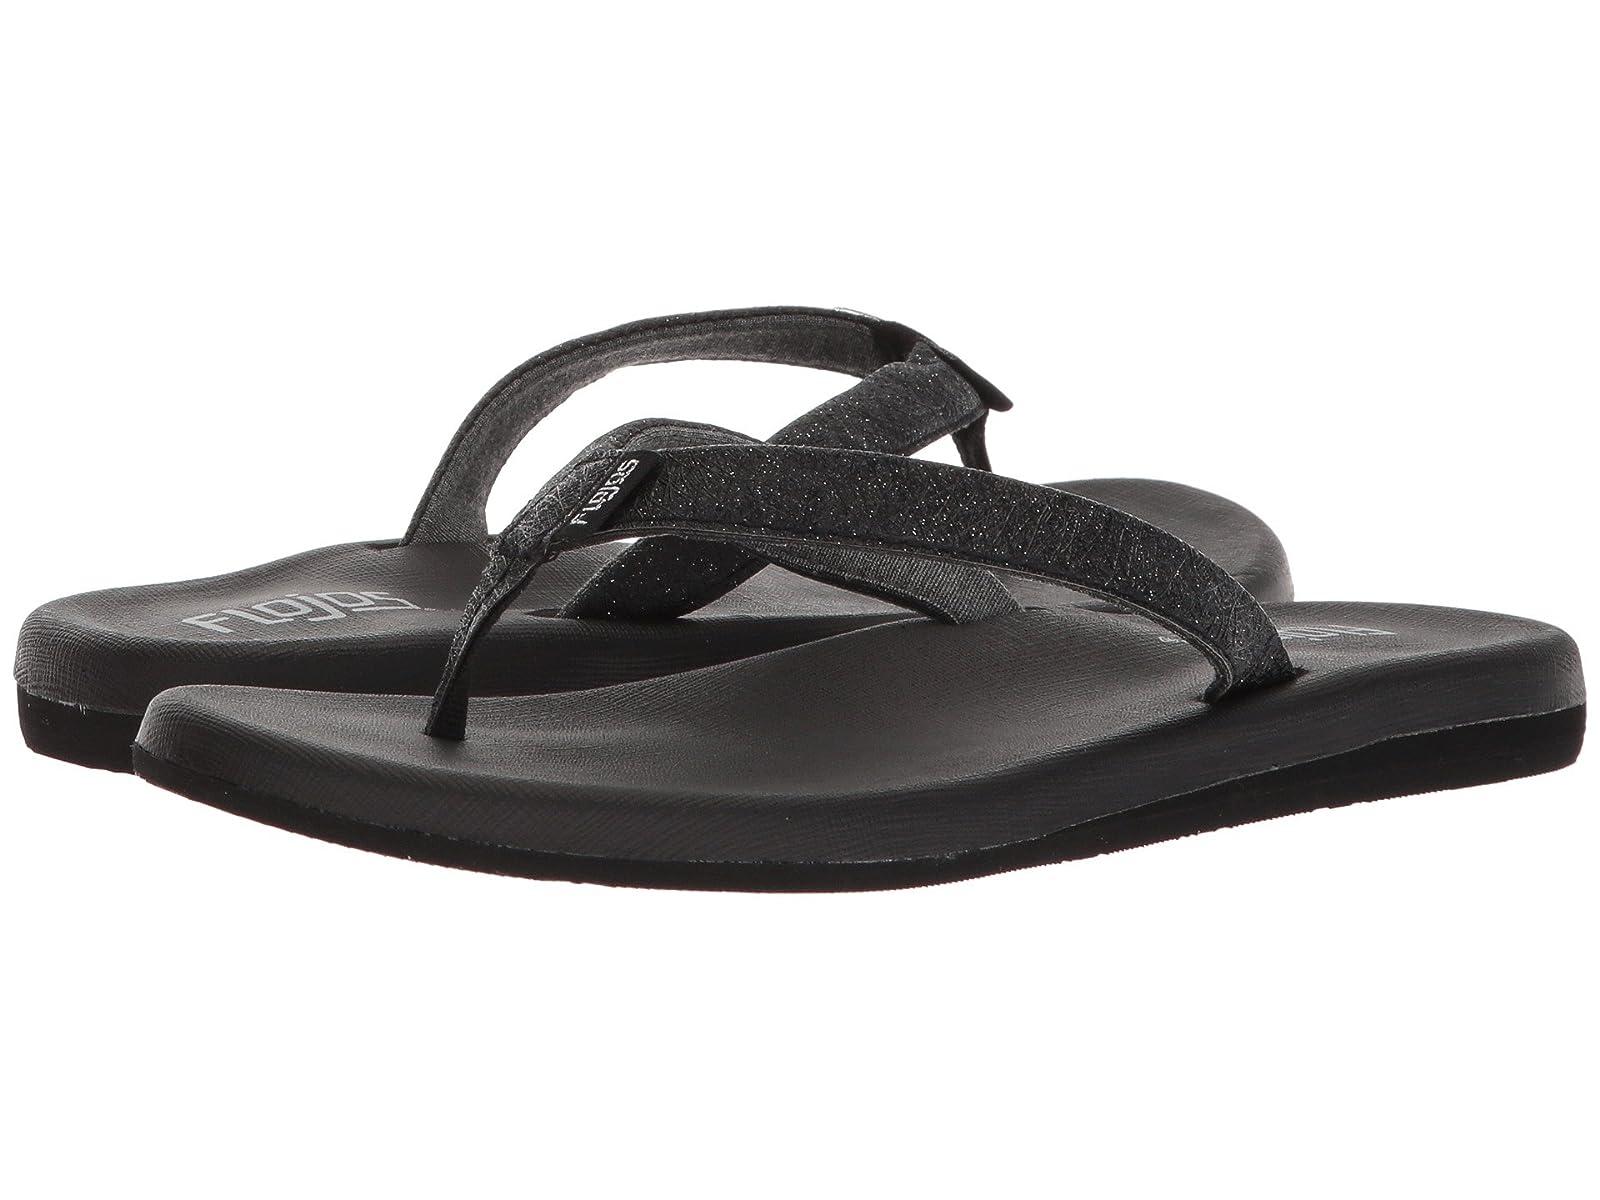 Flojos CampbellAtmospheric grades have affordable shoes